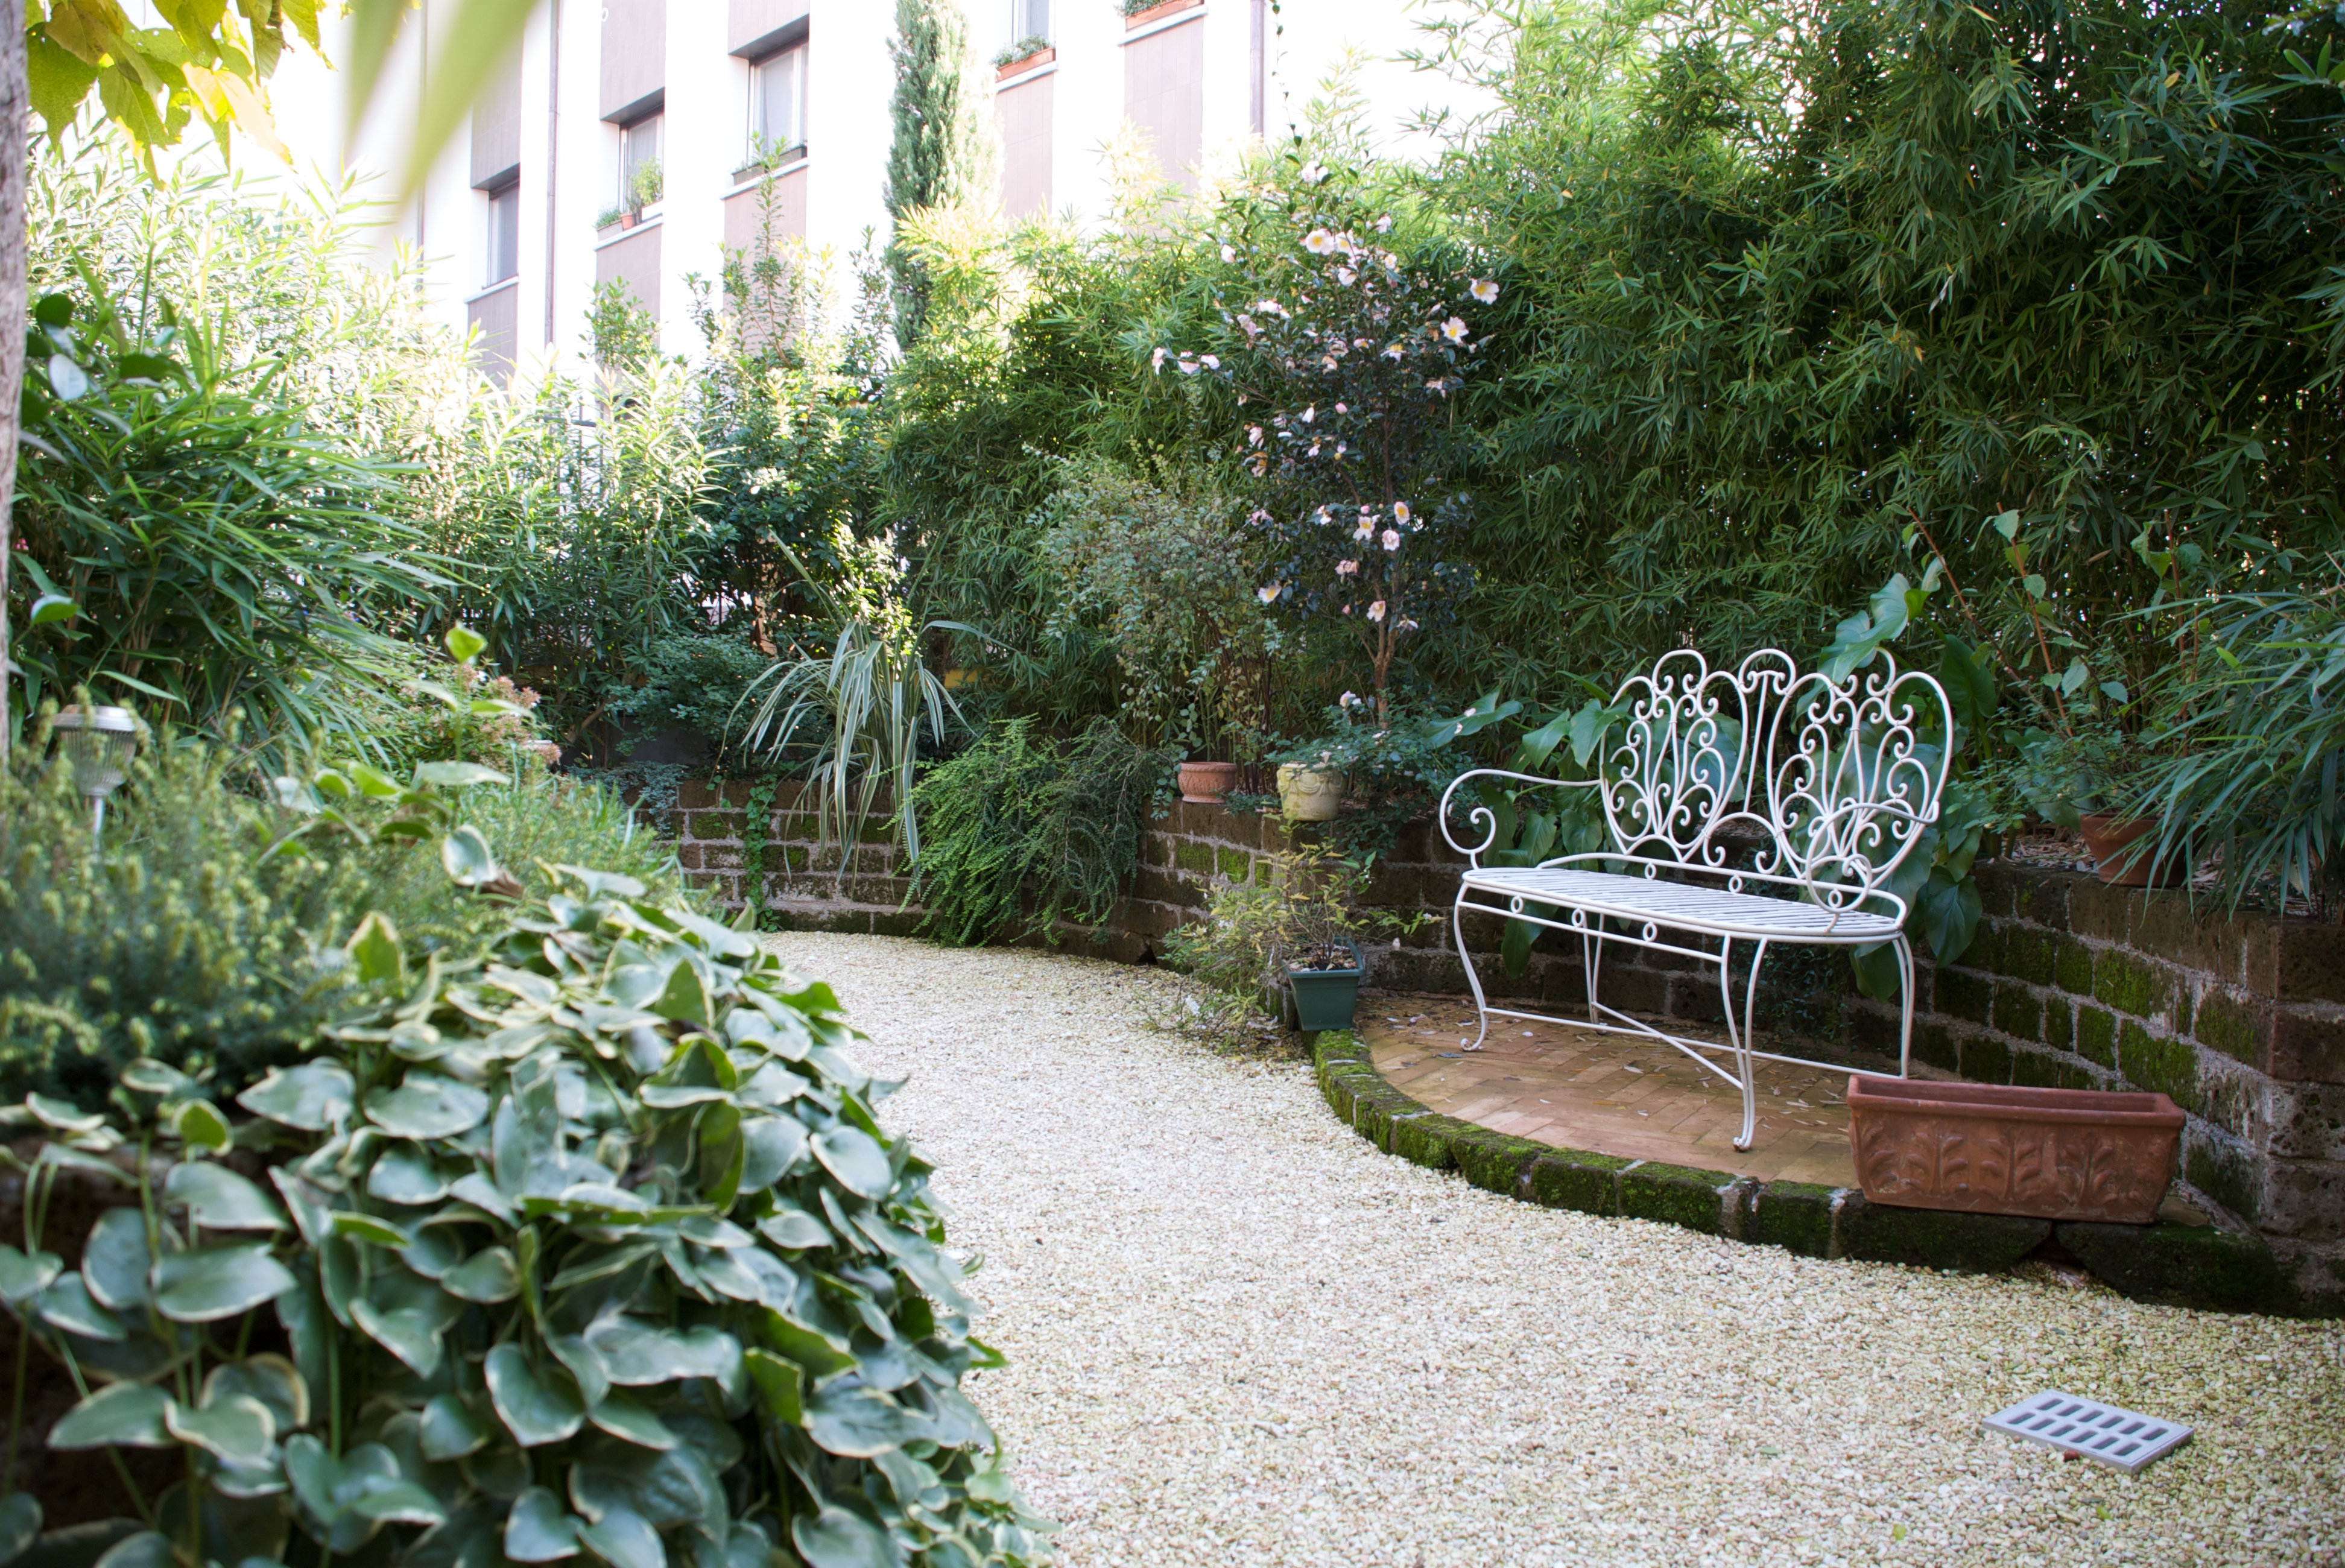 Giardinieri Milano - Gallery Fotografica | Fratelli Bonoldi Giardini